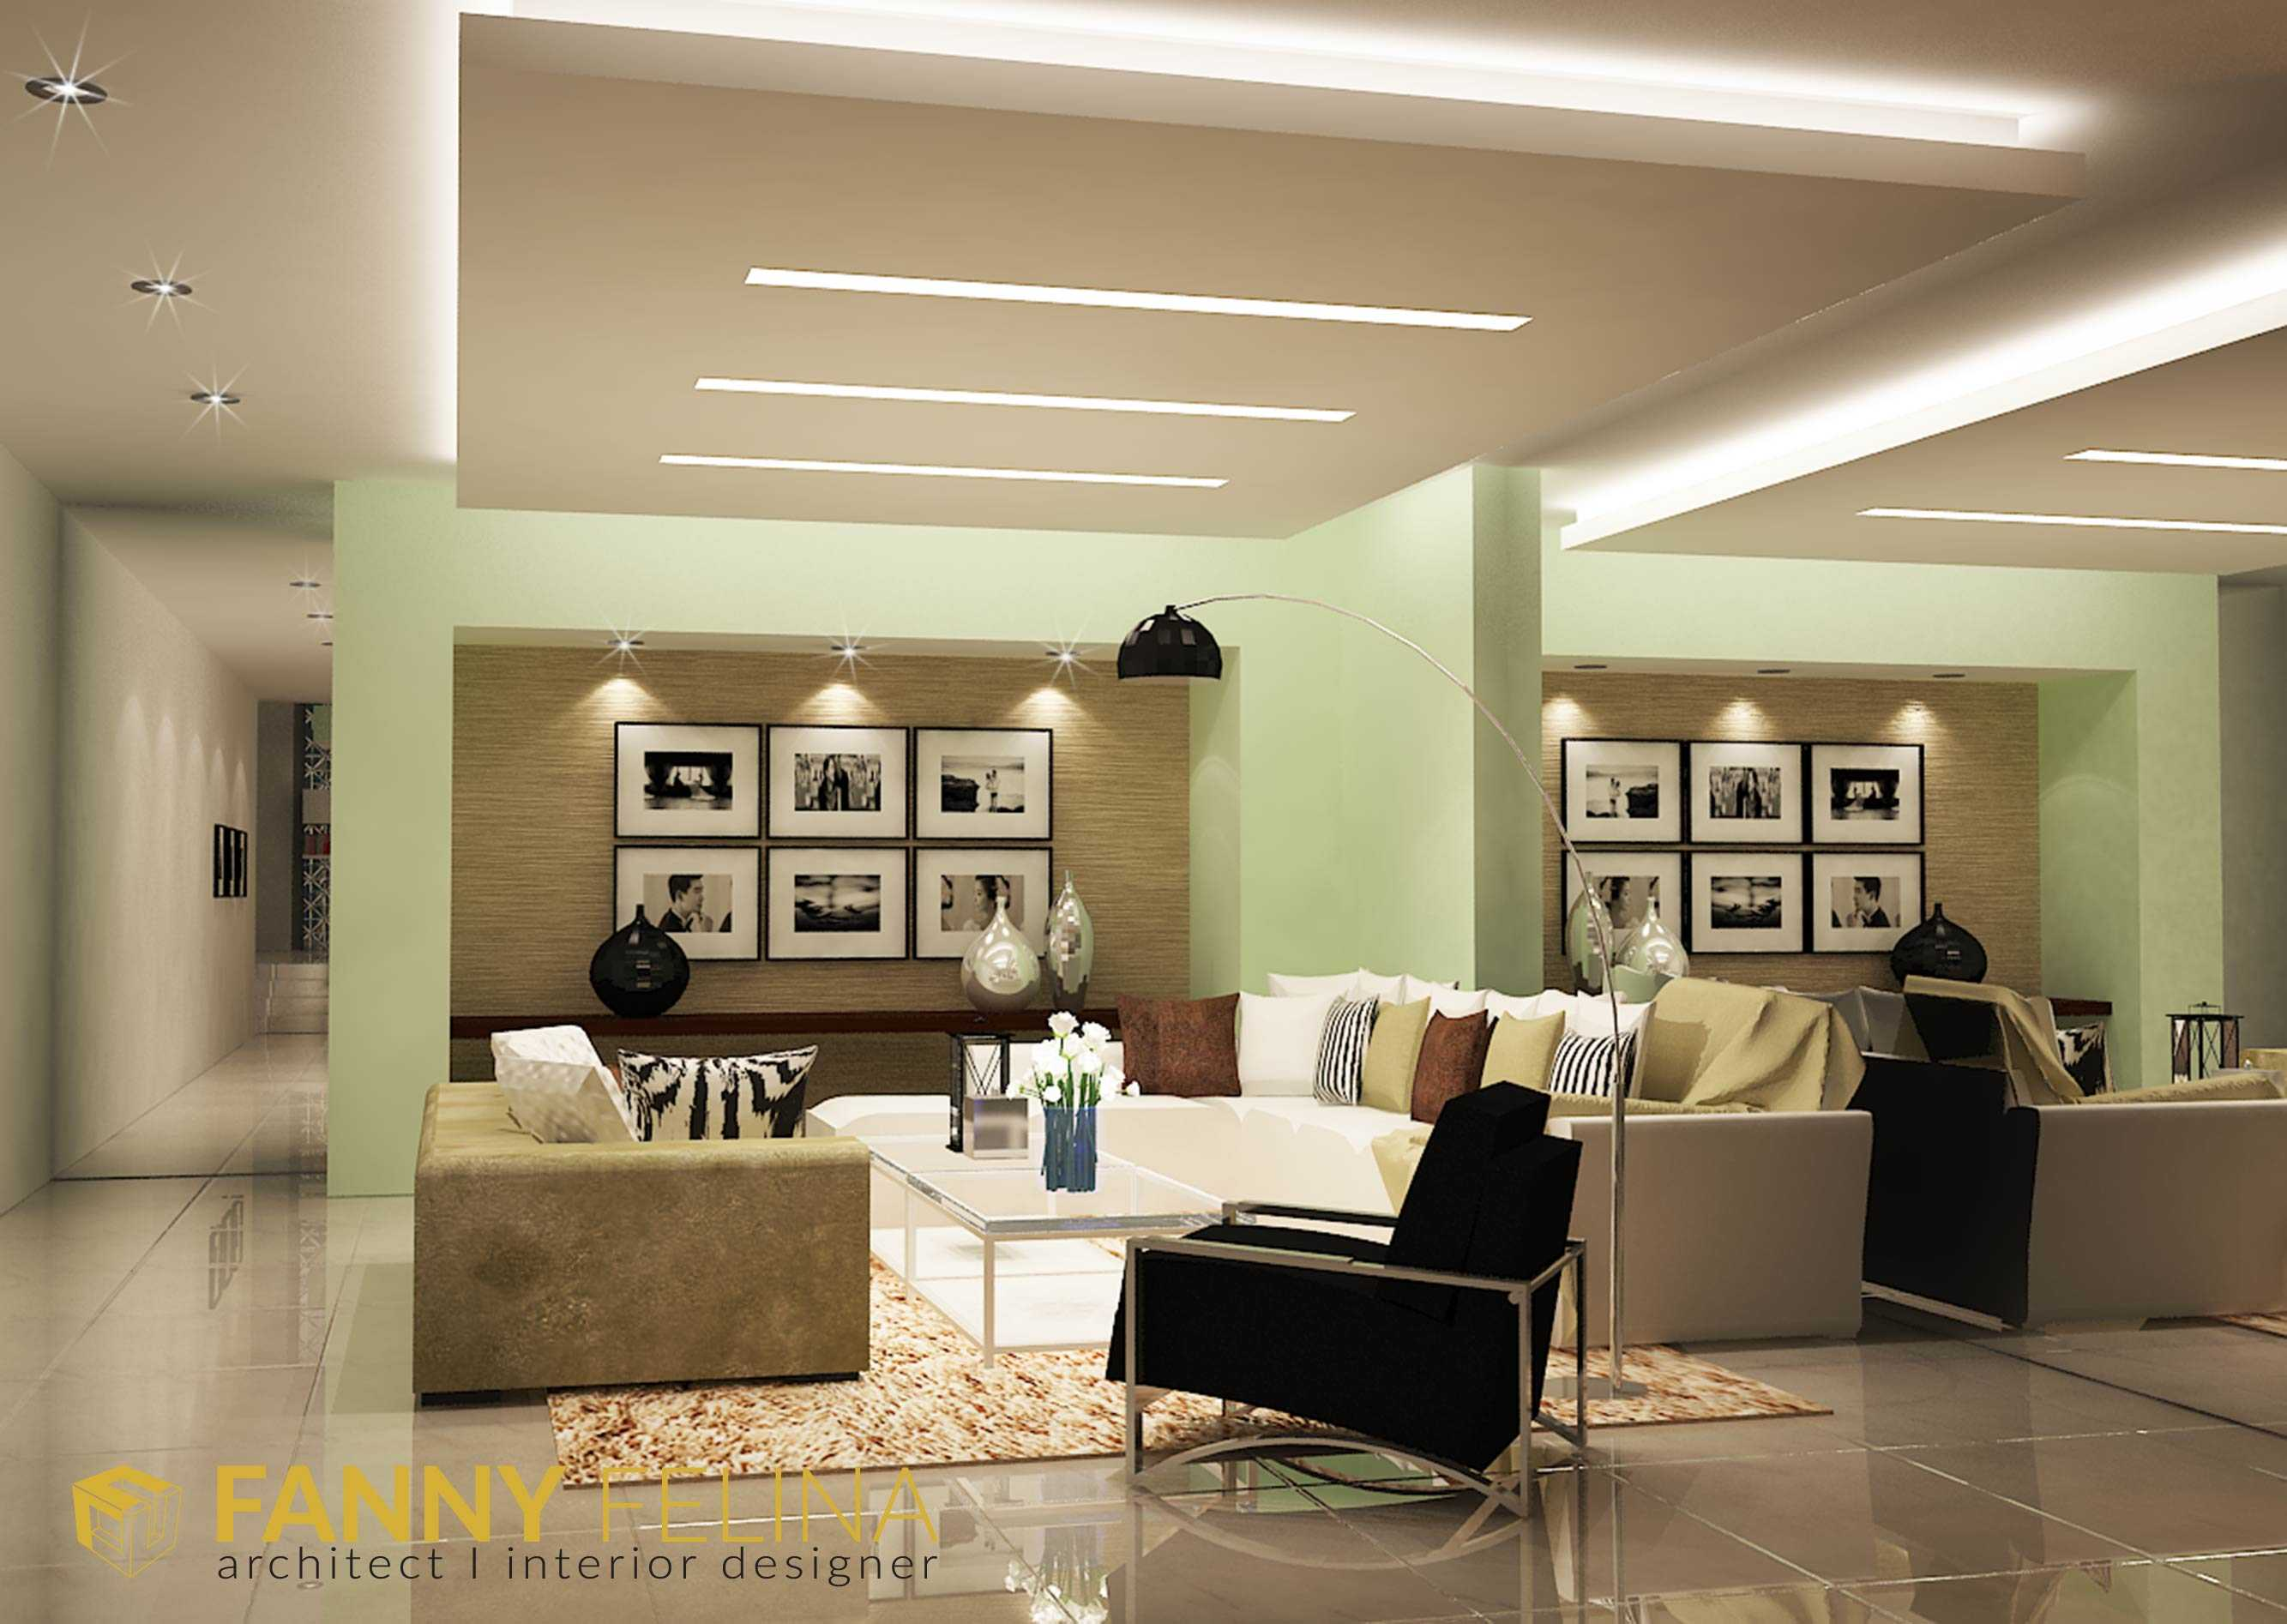 Fanny Felina Architecture & Interior Design Hercules House Surabaya, Surabaya City, East Java, Indonesia Surabaya, Surabaya City, East Java, Indonesia 03 Modern  34576